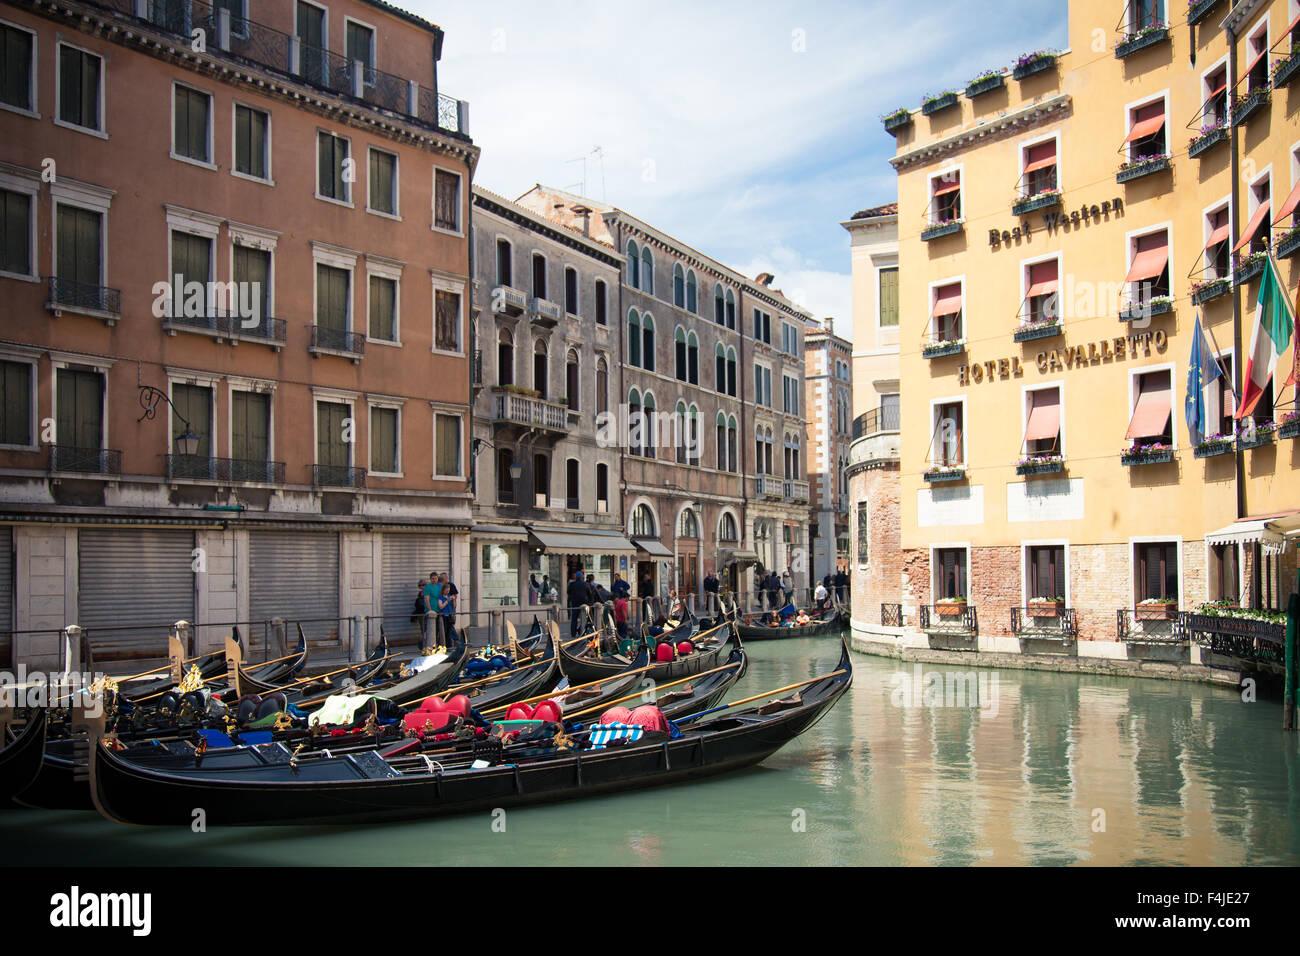 Gondola Sstation Bacino Orseolo in Venice - Stock Image